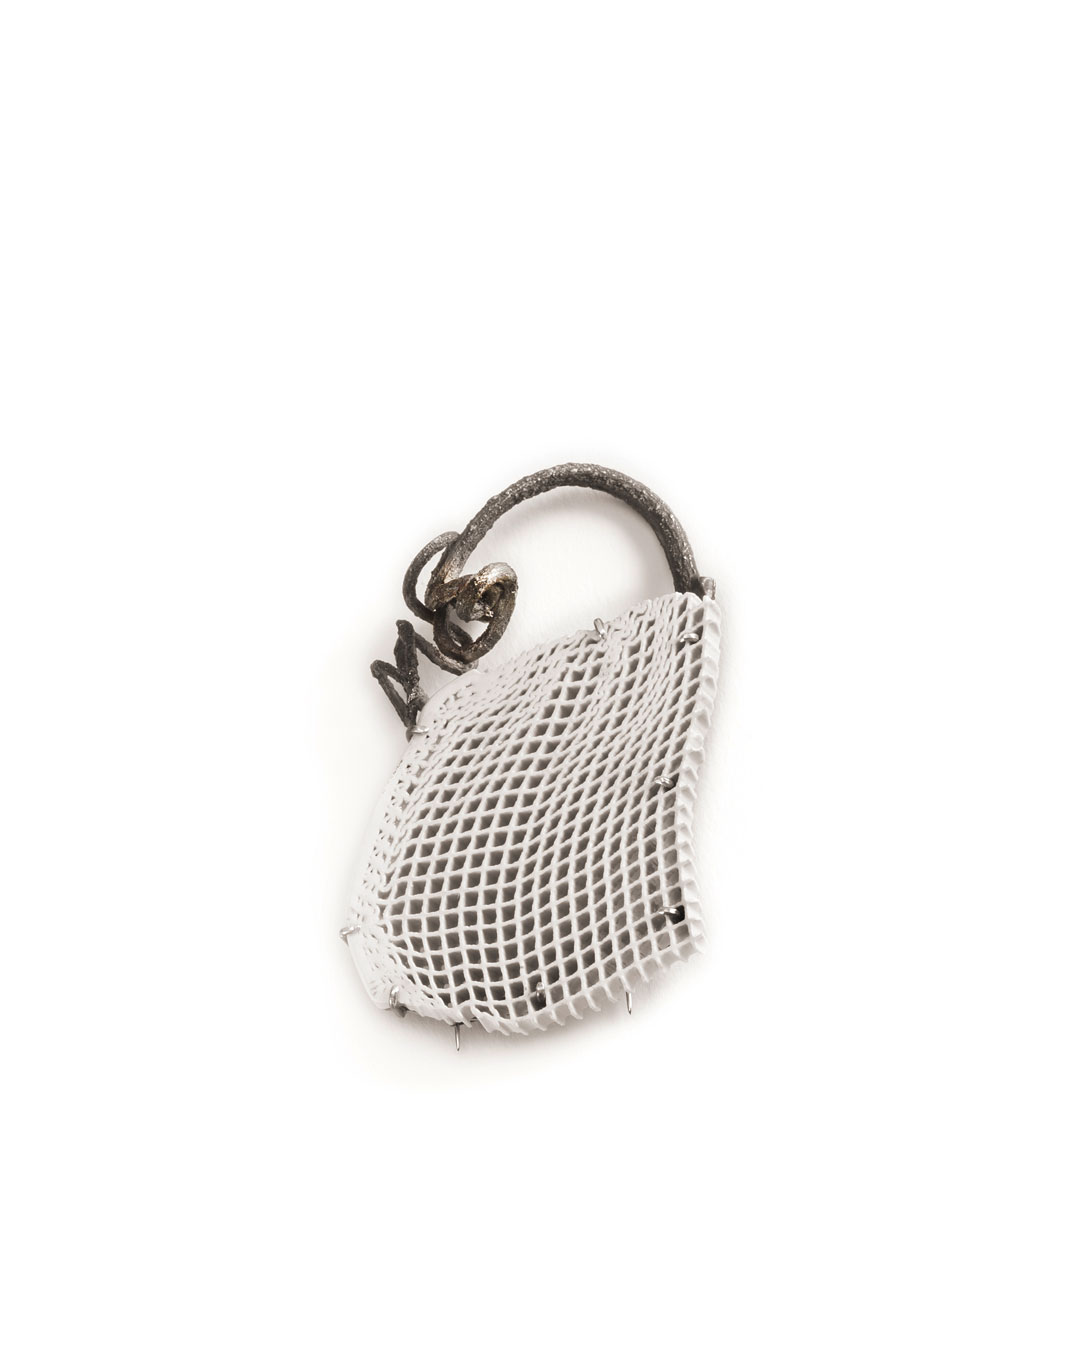 Silke Trekel, Handtasche (Handbag), 2014, brooch; porcelain, silver, 46 x 76 x 8 mm, €780